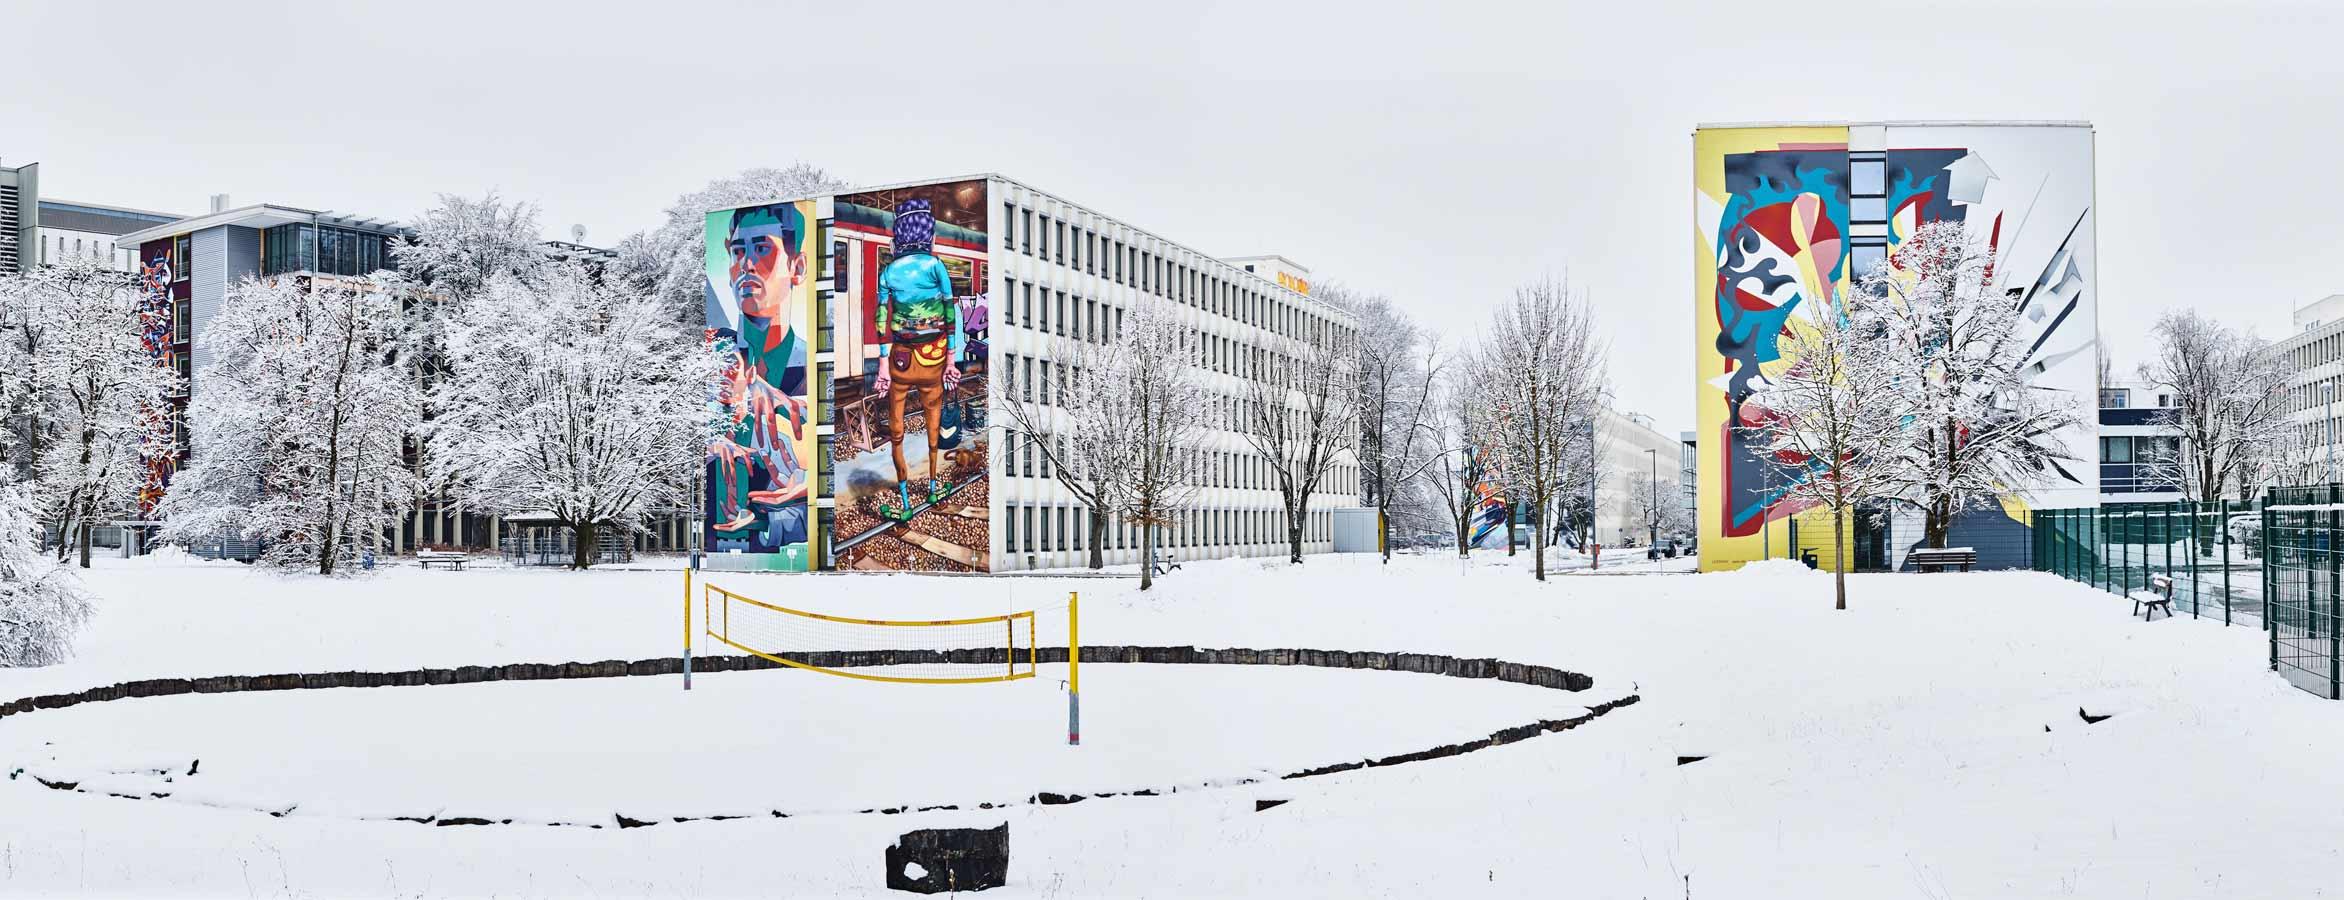 Scale-Street-Art-Siemens-Gelaende-Muenchen-2017--8